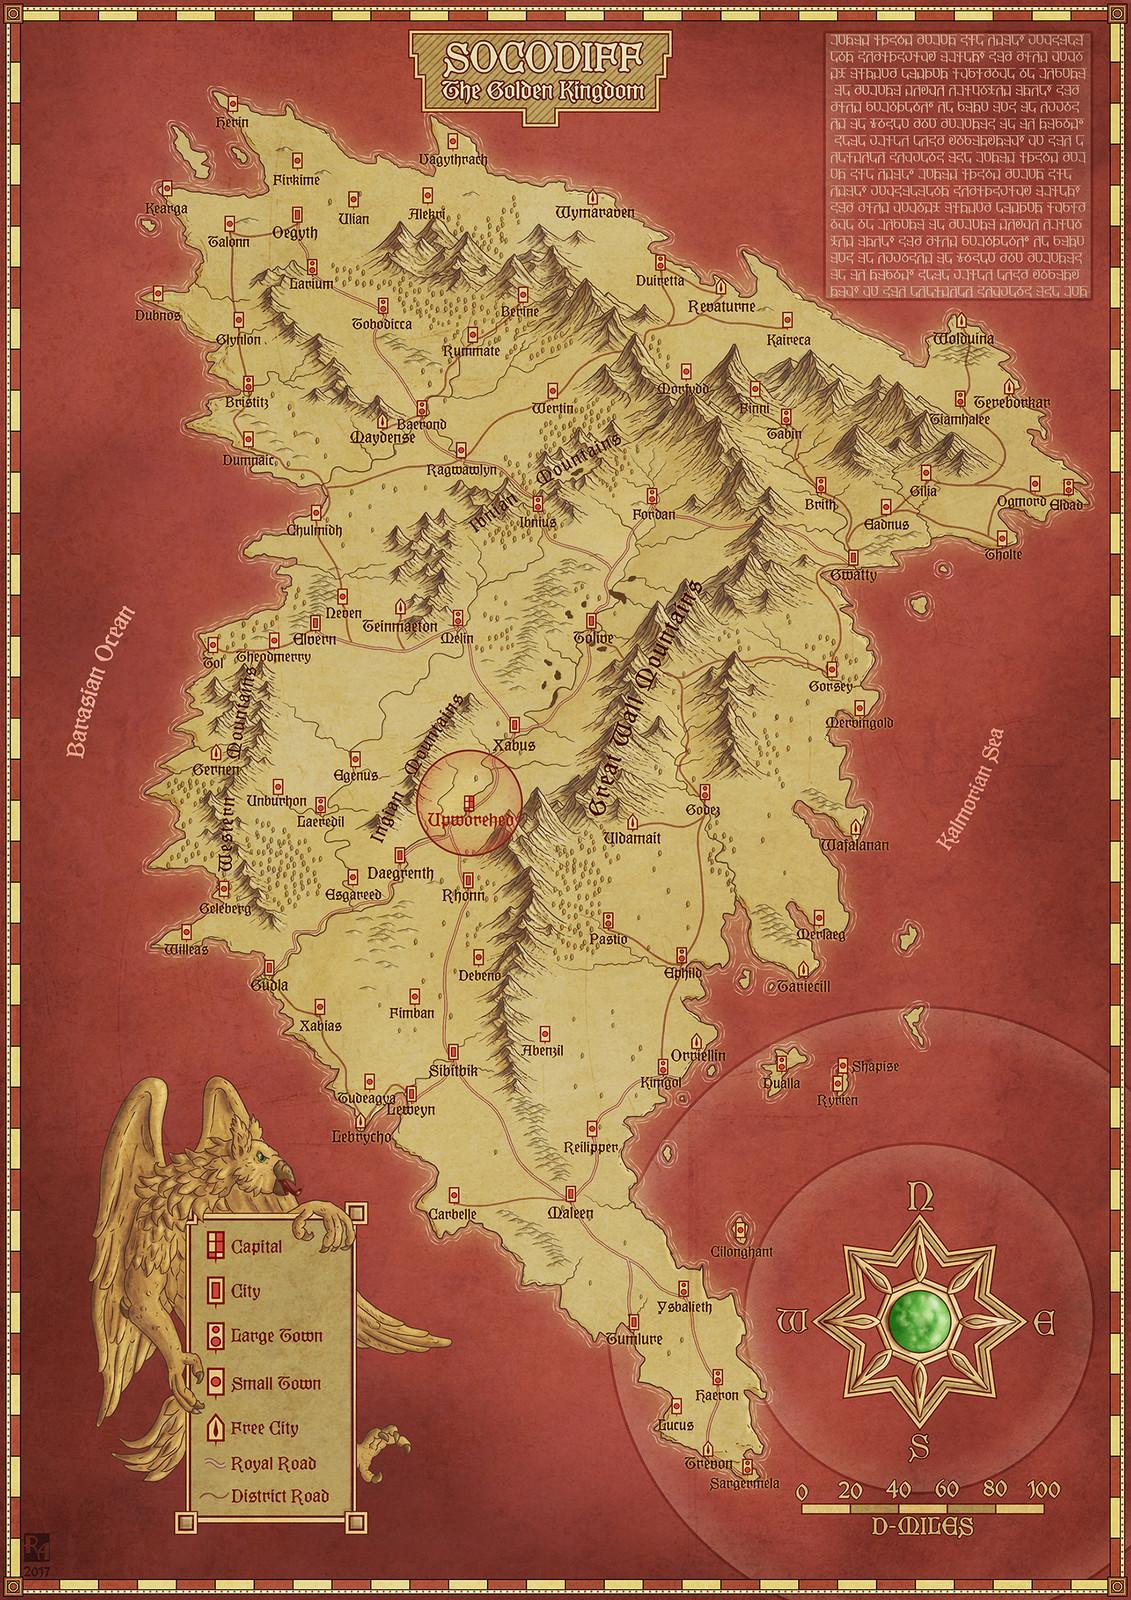 Socodiff - The Golden Kingdom